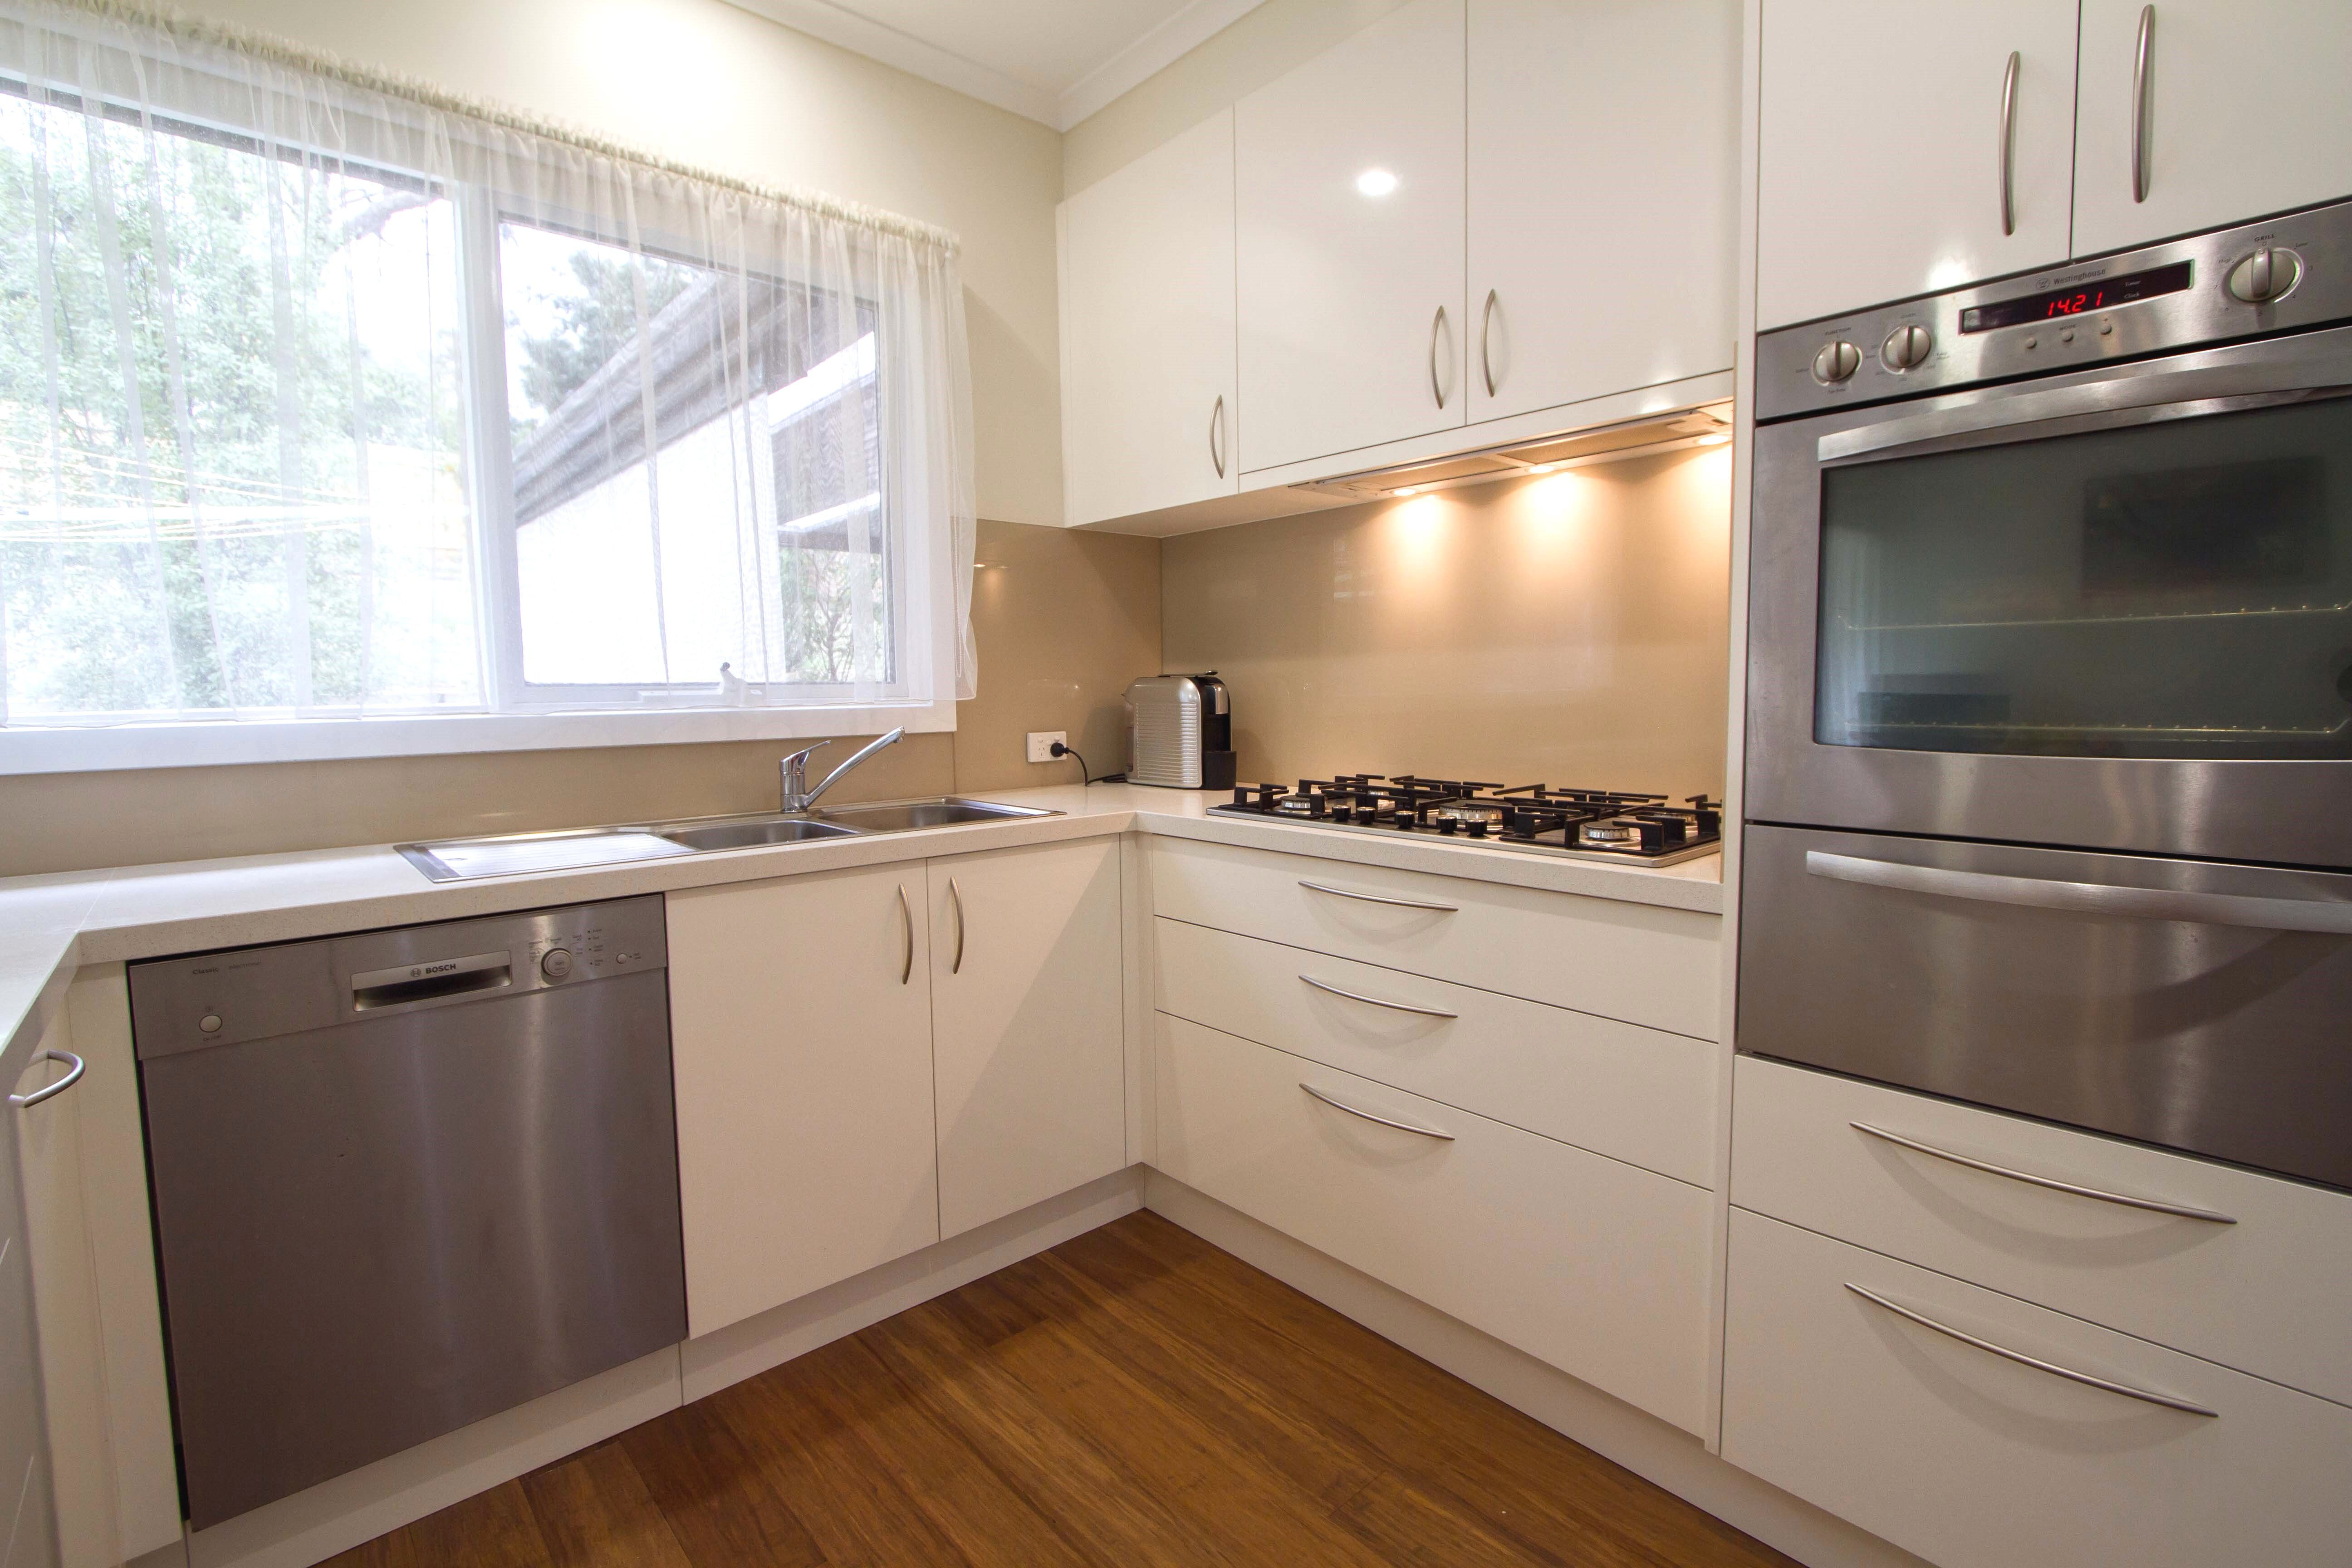 this kitchen is simple yet elegant light and bright www thekitchendesigncentre com au on kitchen organization elegant id=38681